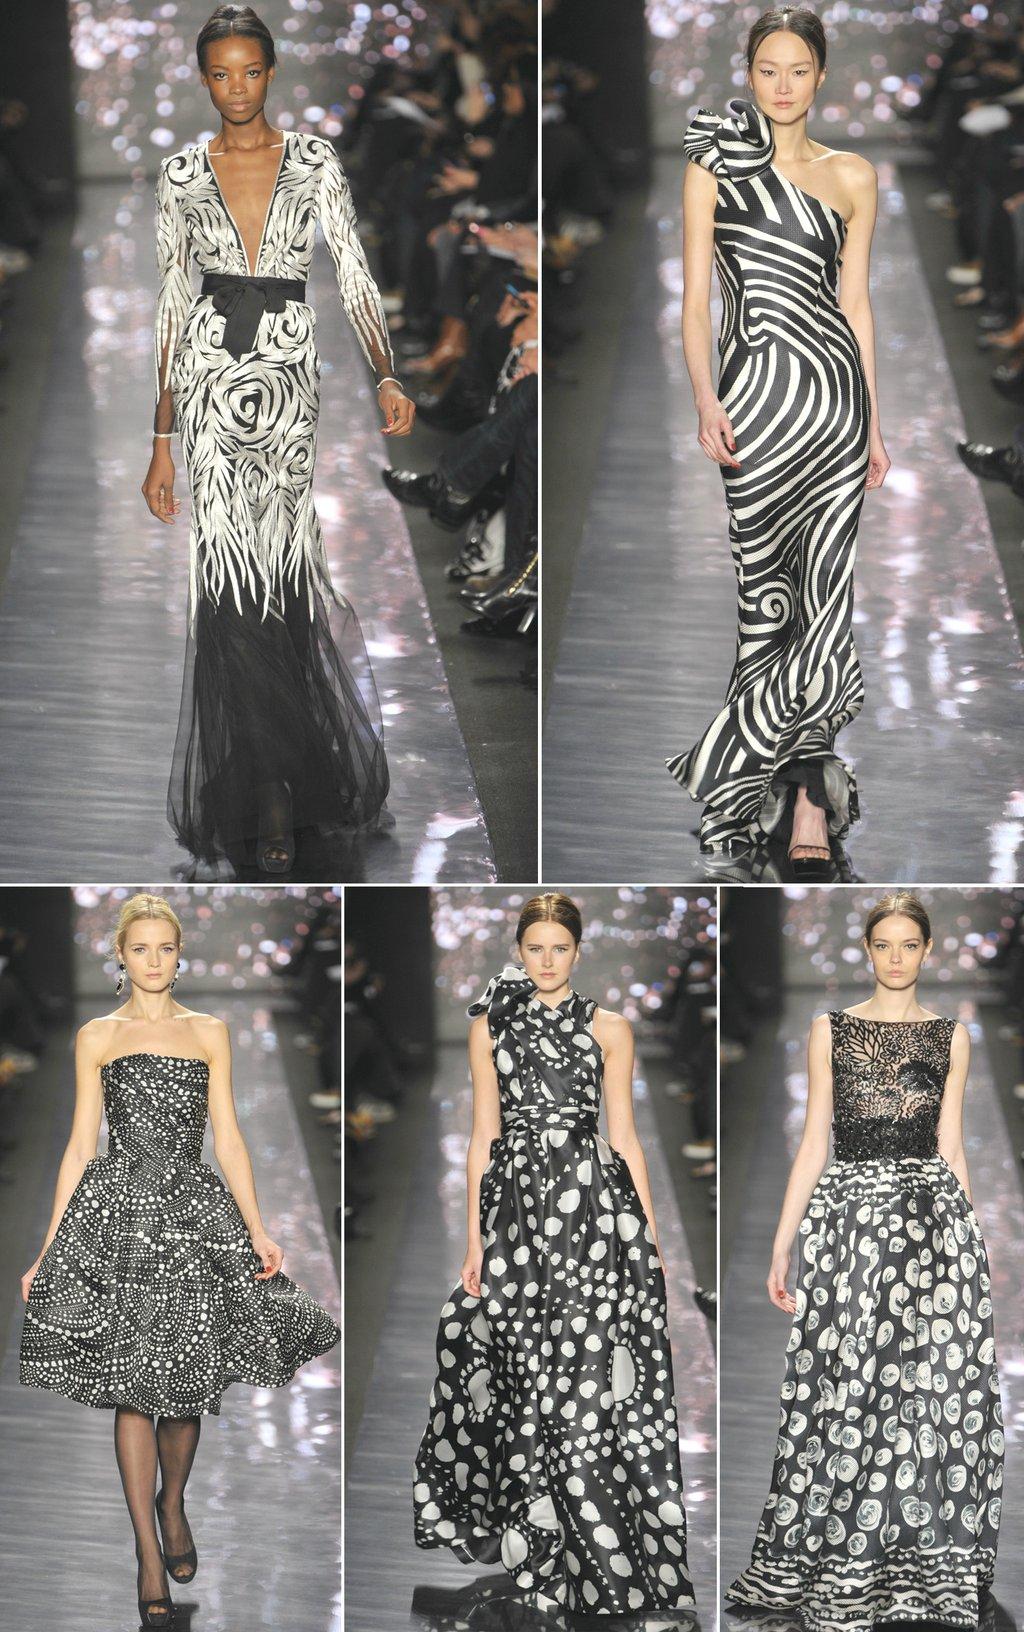 Black-white-wedding-dress-inspiration-2012-wedding-trends-prints.full